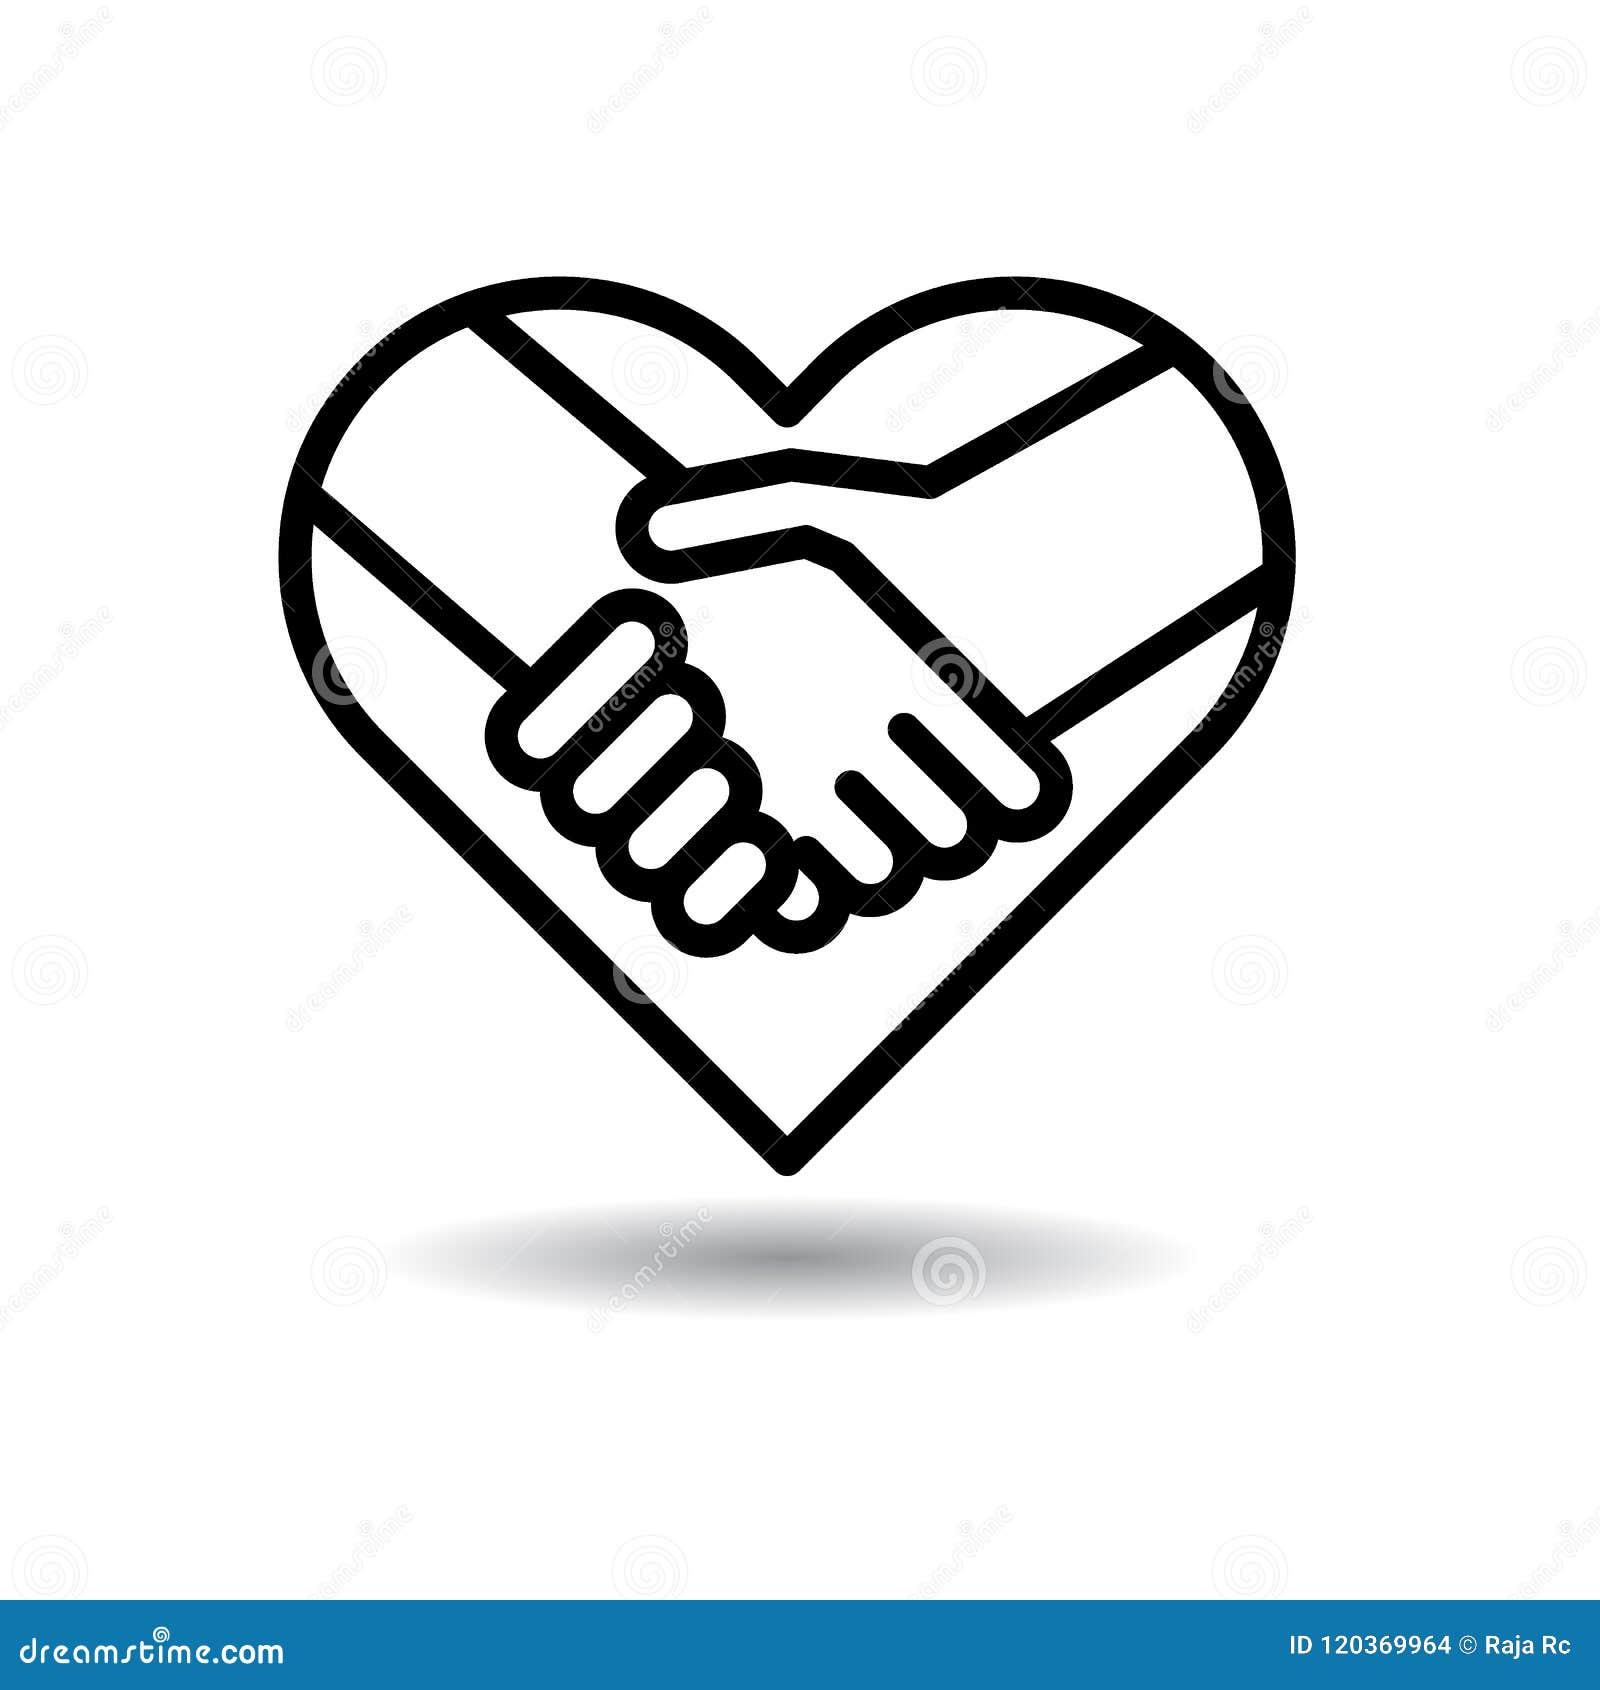 Handshake icon in heart